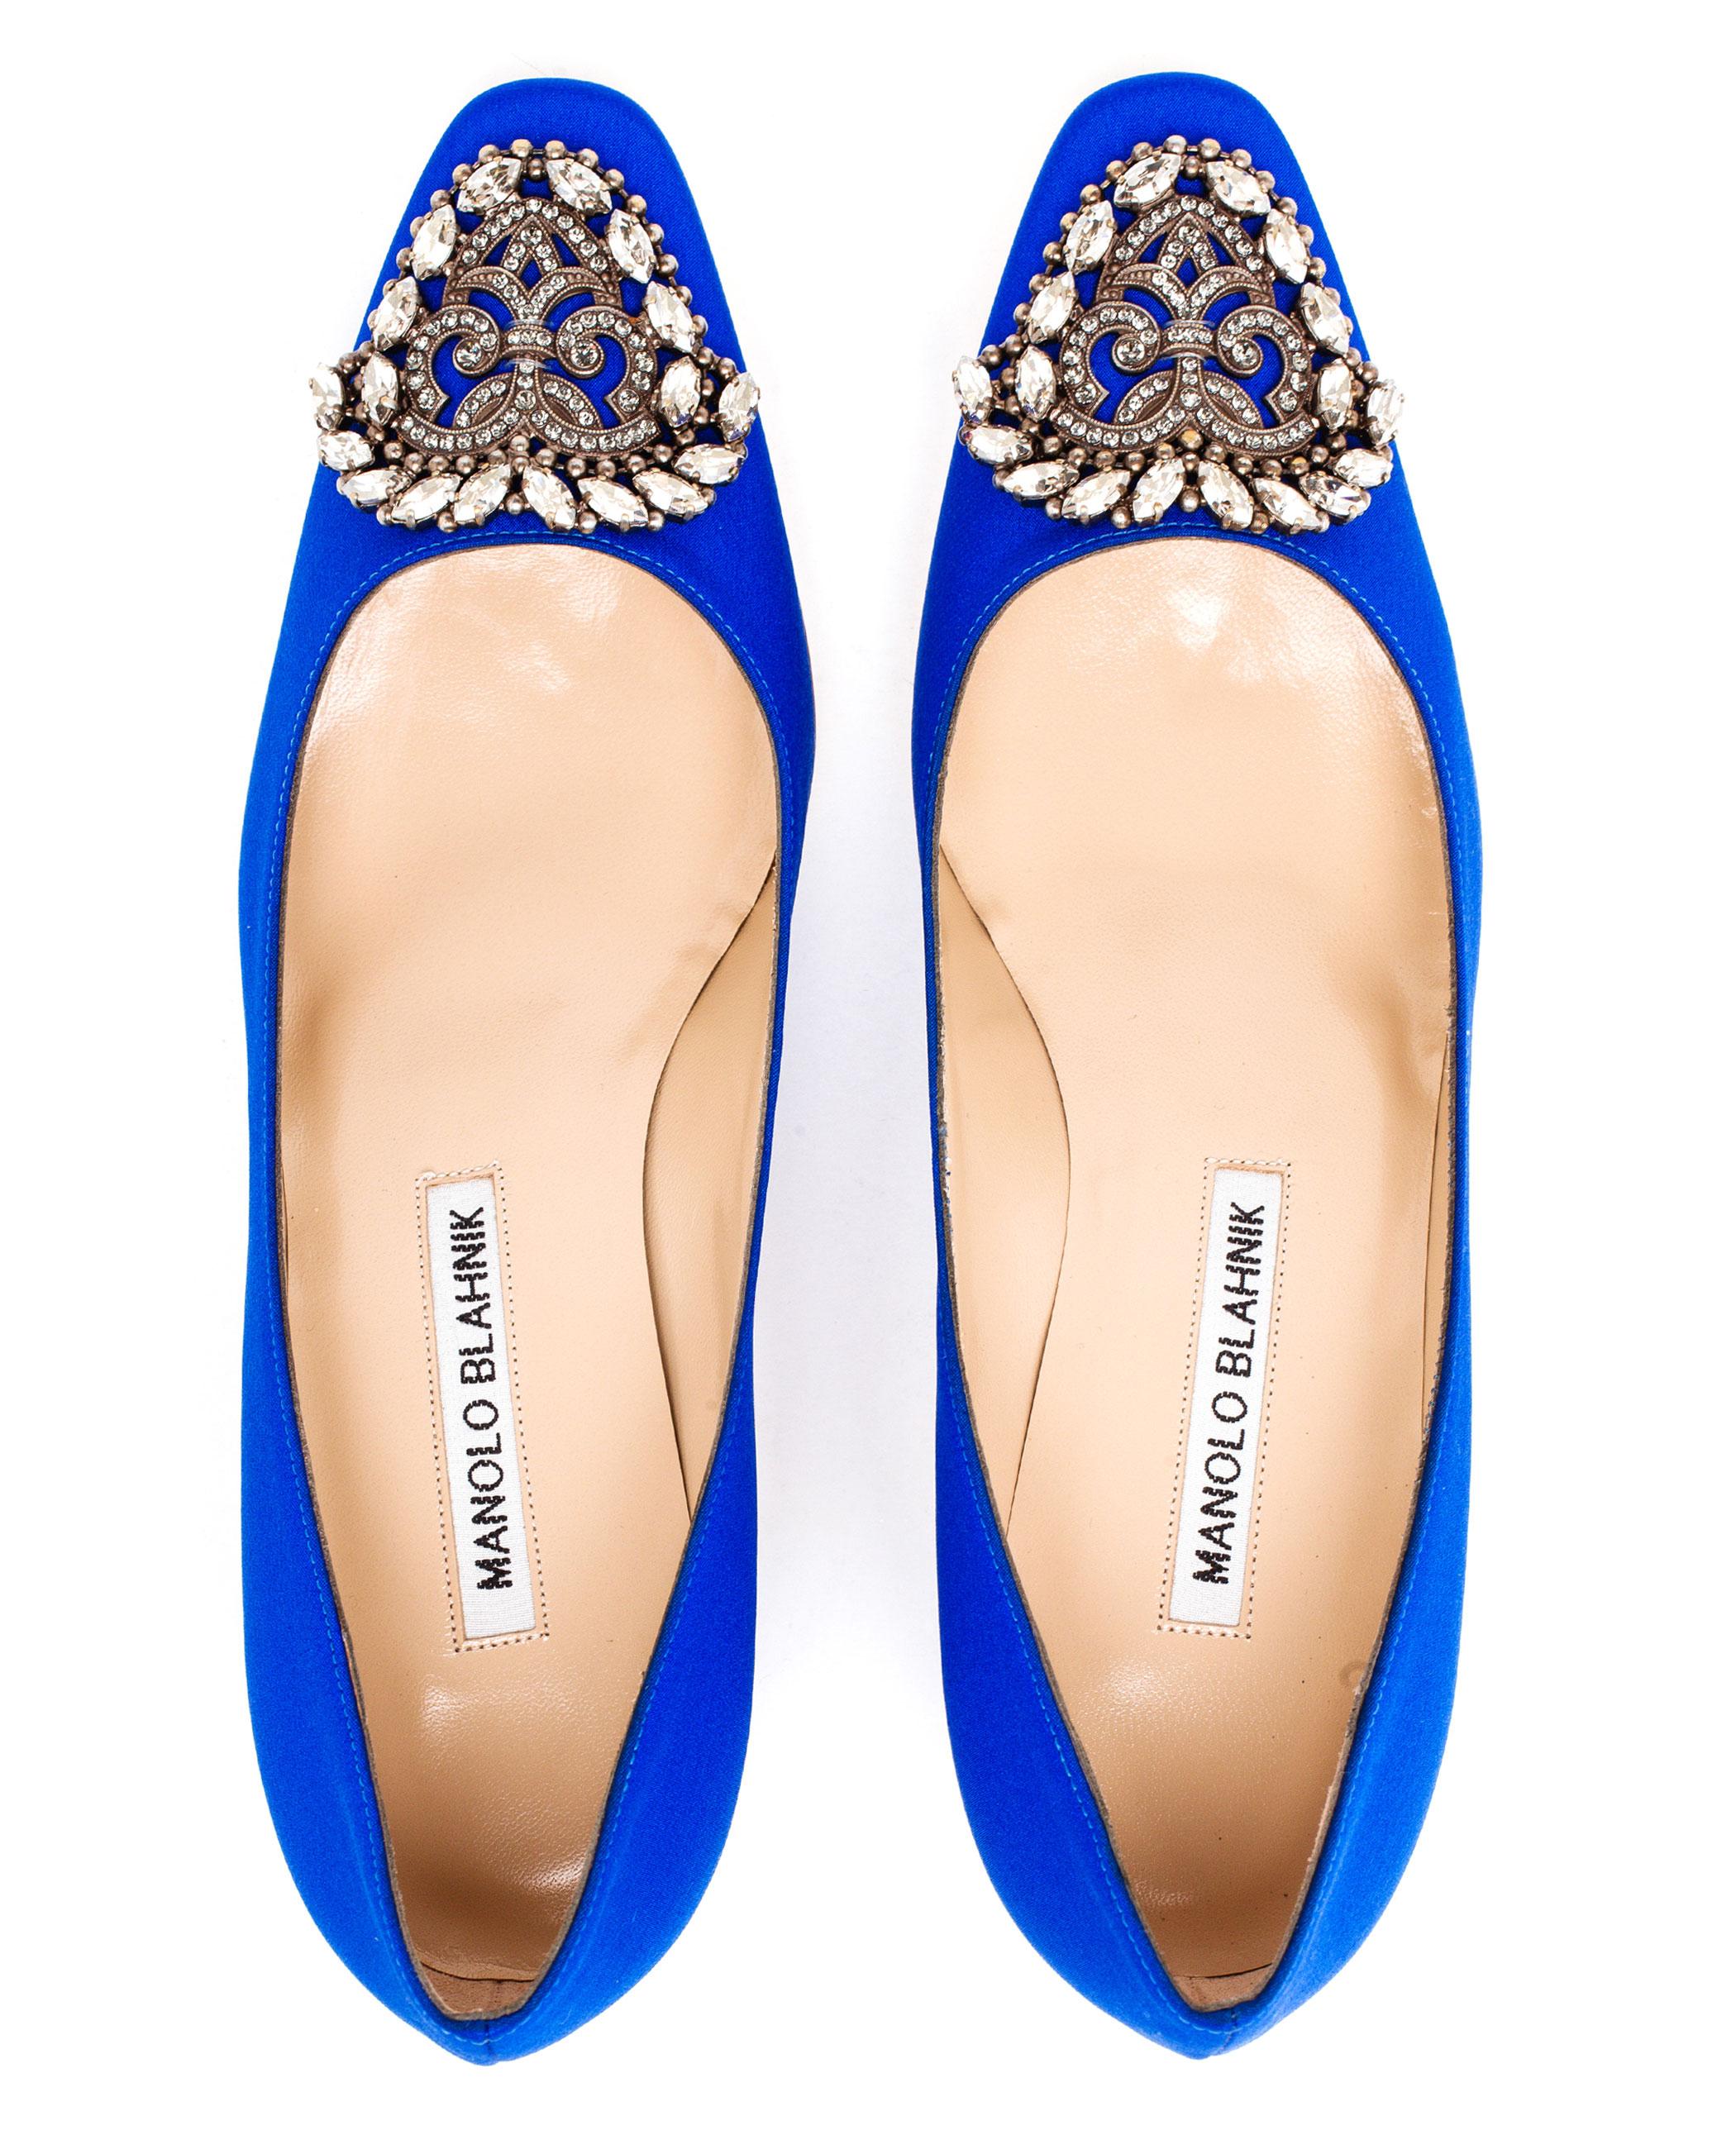 469429961135552216 also Manolo Blahnik Crepe Okkato Mid Pump Blue in addition Heels likewise Sapatos Para Noivas Classicas besides Jennifer Garner Angie Harmon And. on oscar de la renta crystal heels